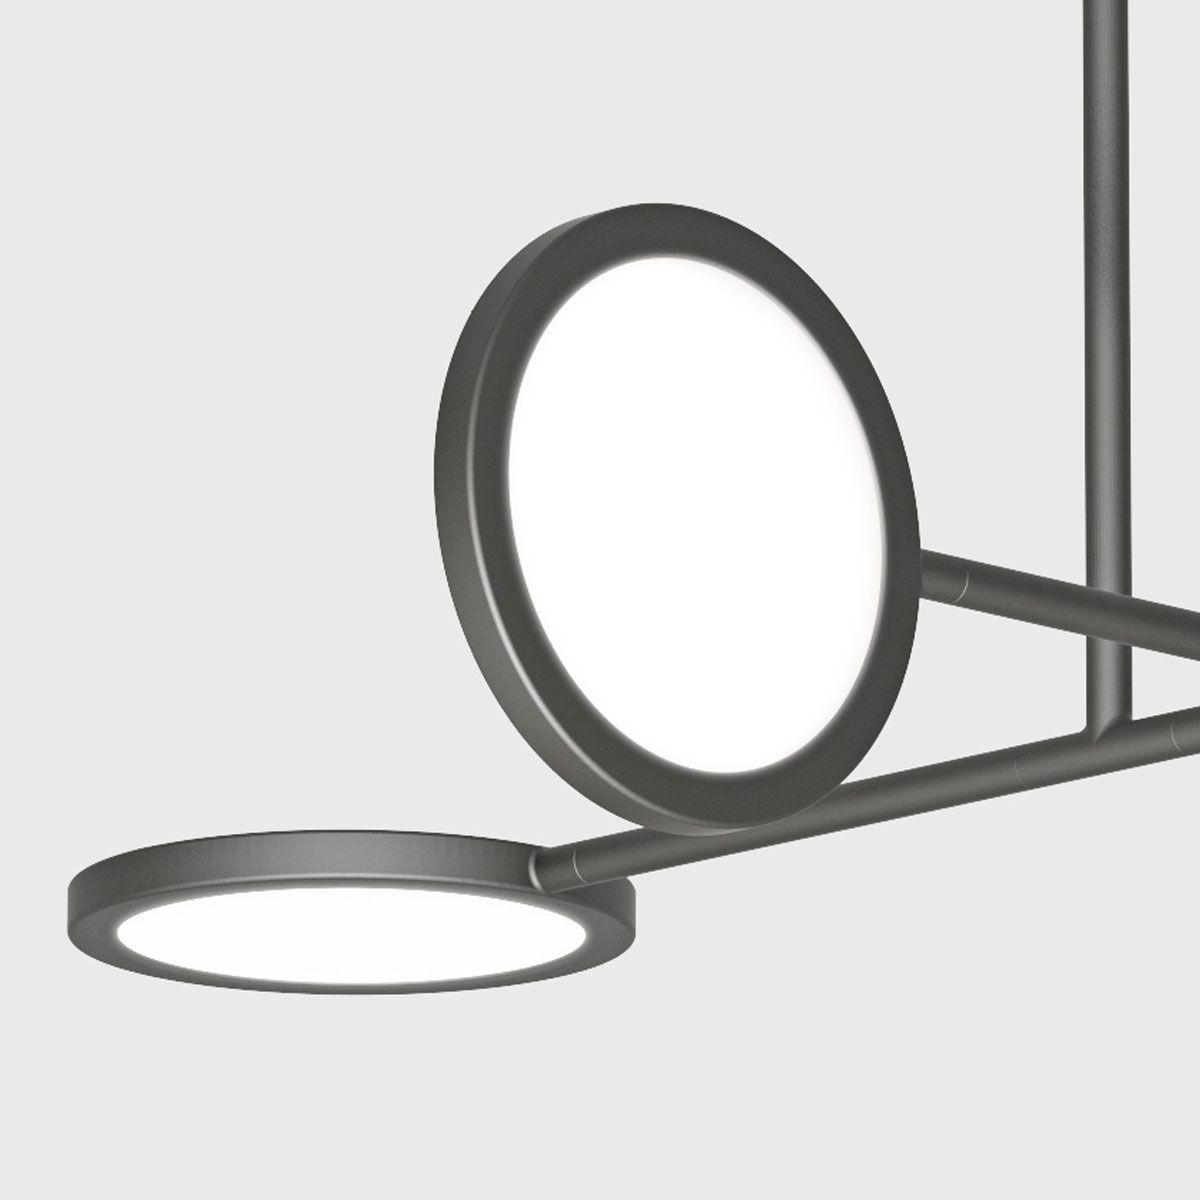 Discus 3 | Jamie Gray pour Matter Made #design #luminaire #decor ... - Discus 3 | Jamie Gray pour Matter Made #design #luminaire #decor  #interiordesign